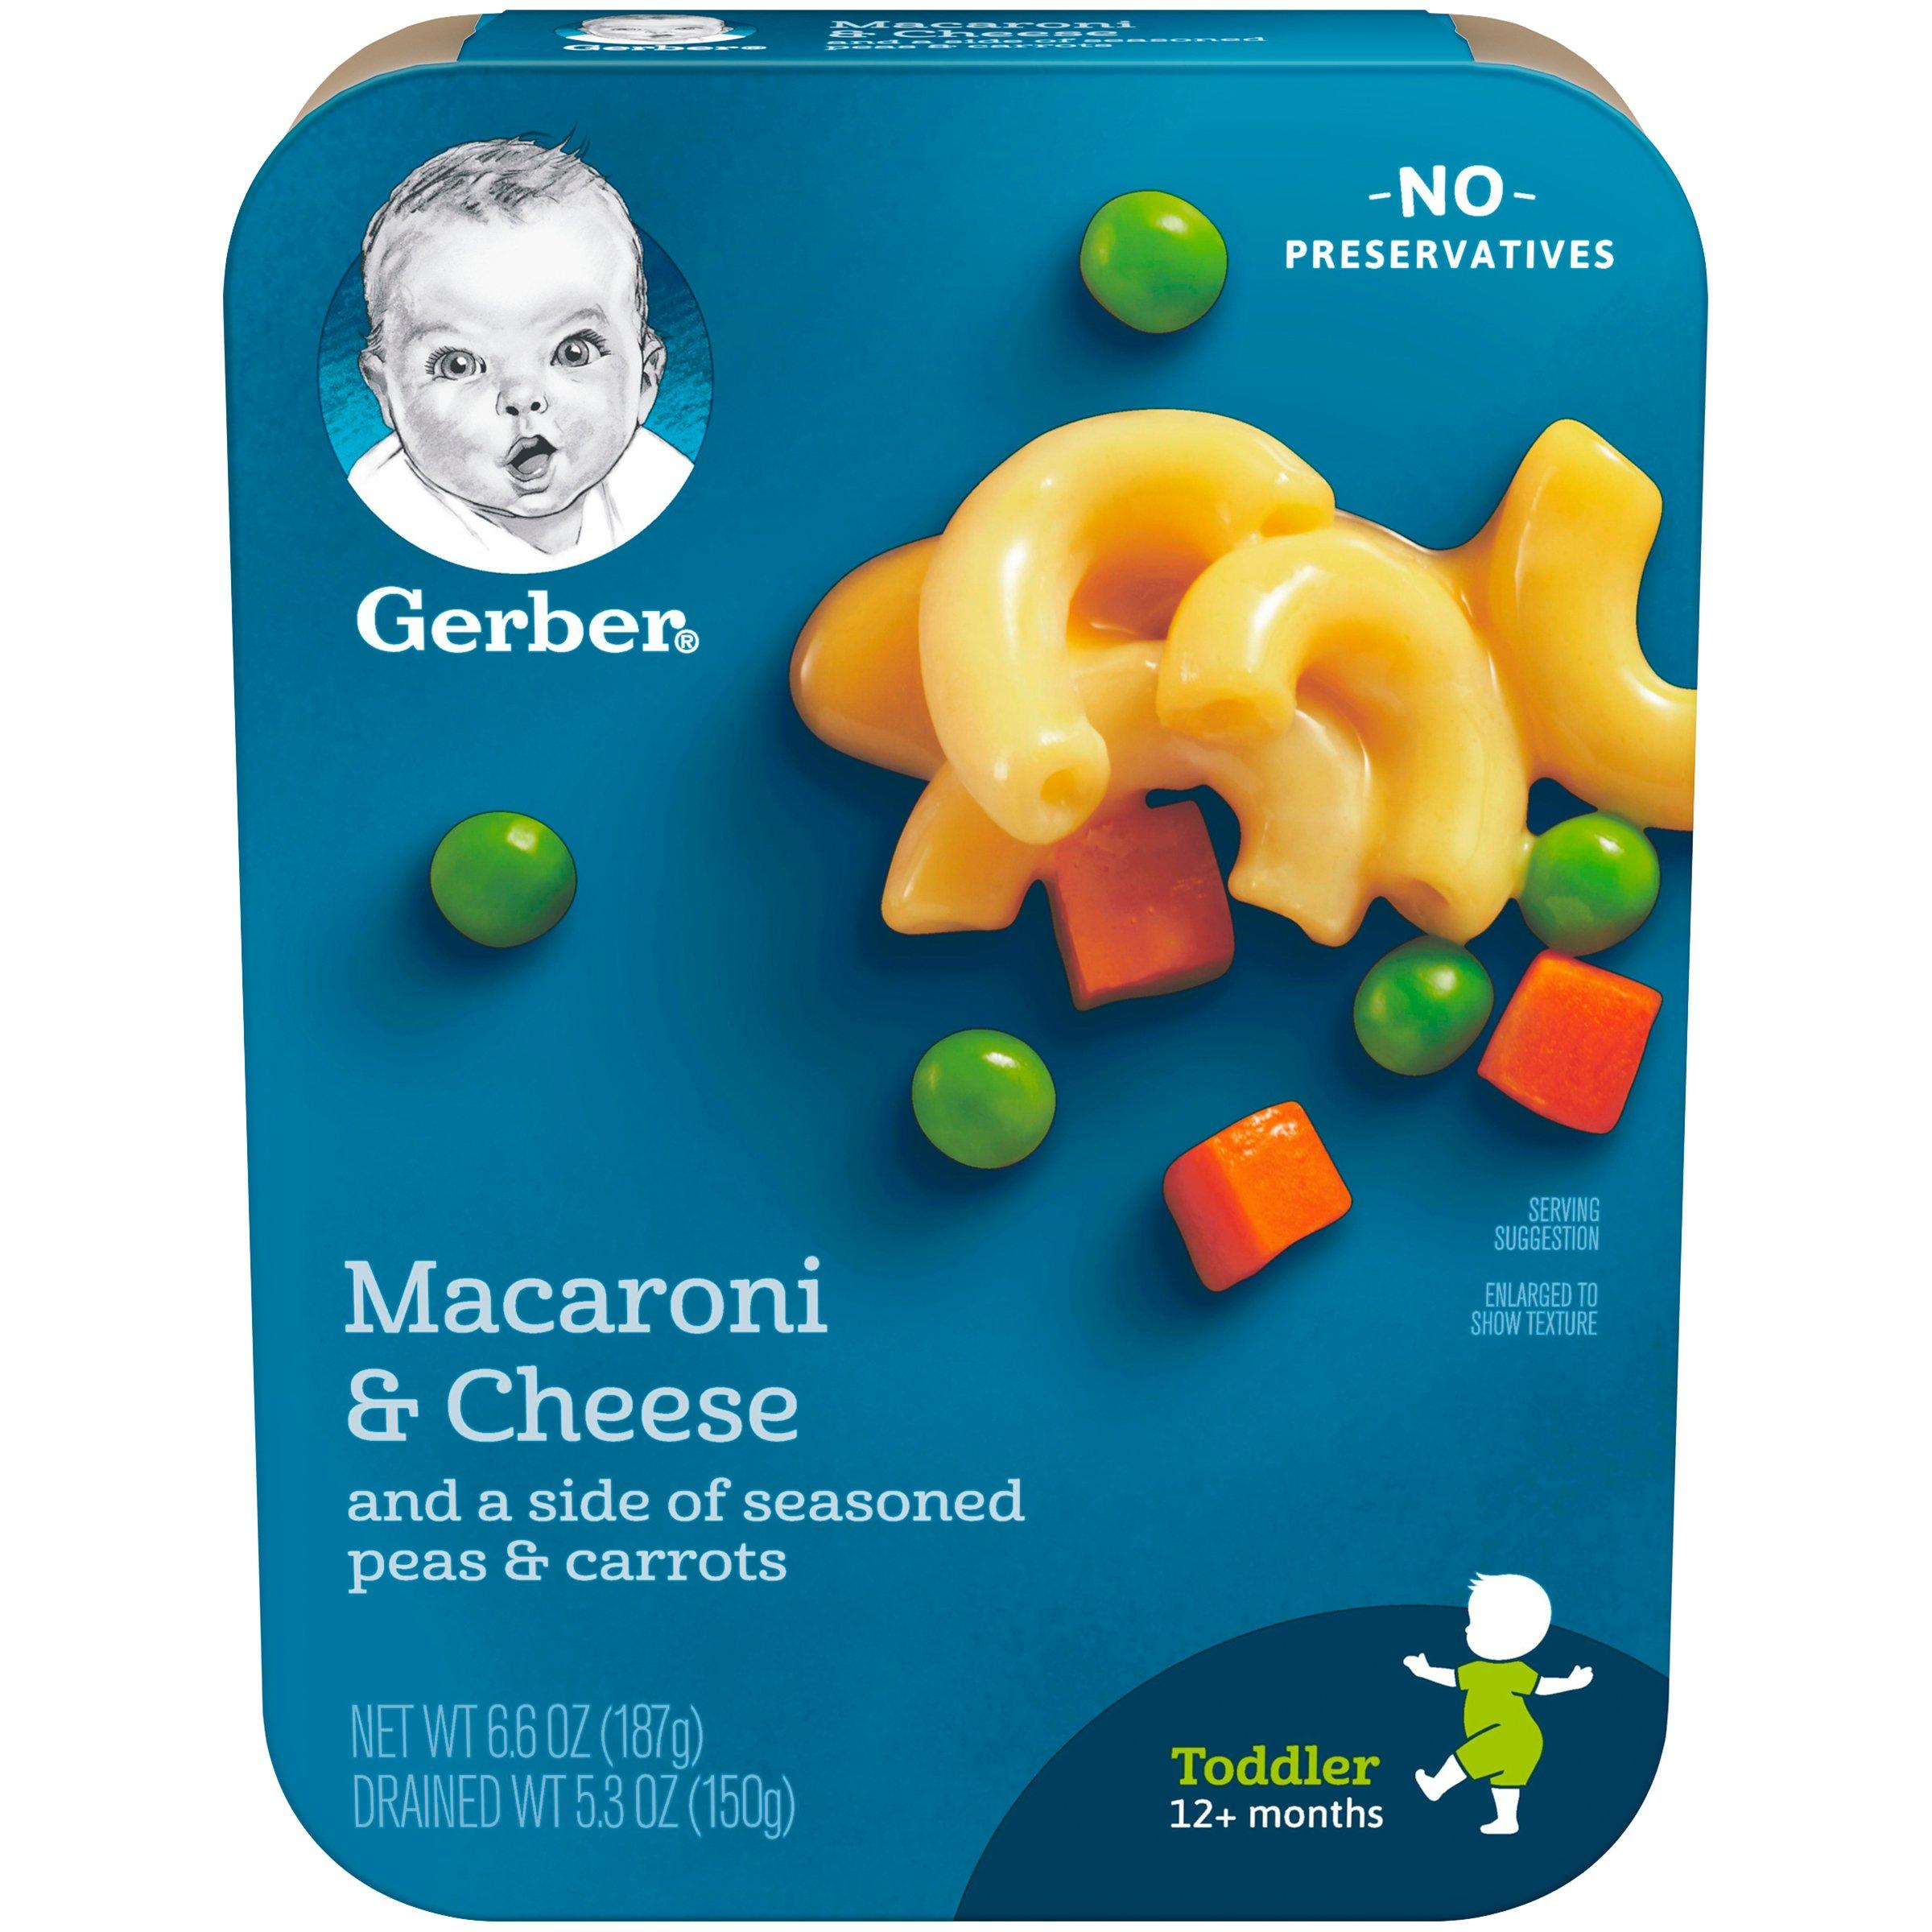 Gerber, Macaroni & Cheese, Peas & Carrots, 6.6 oz